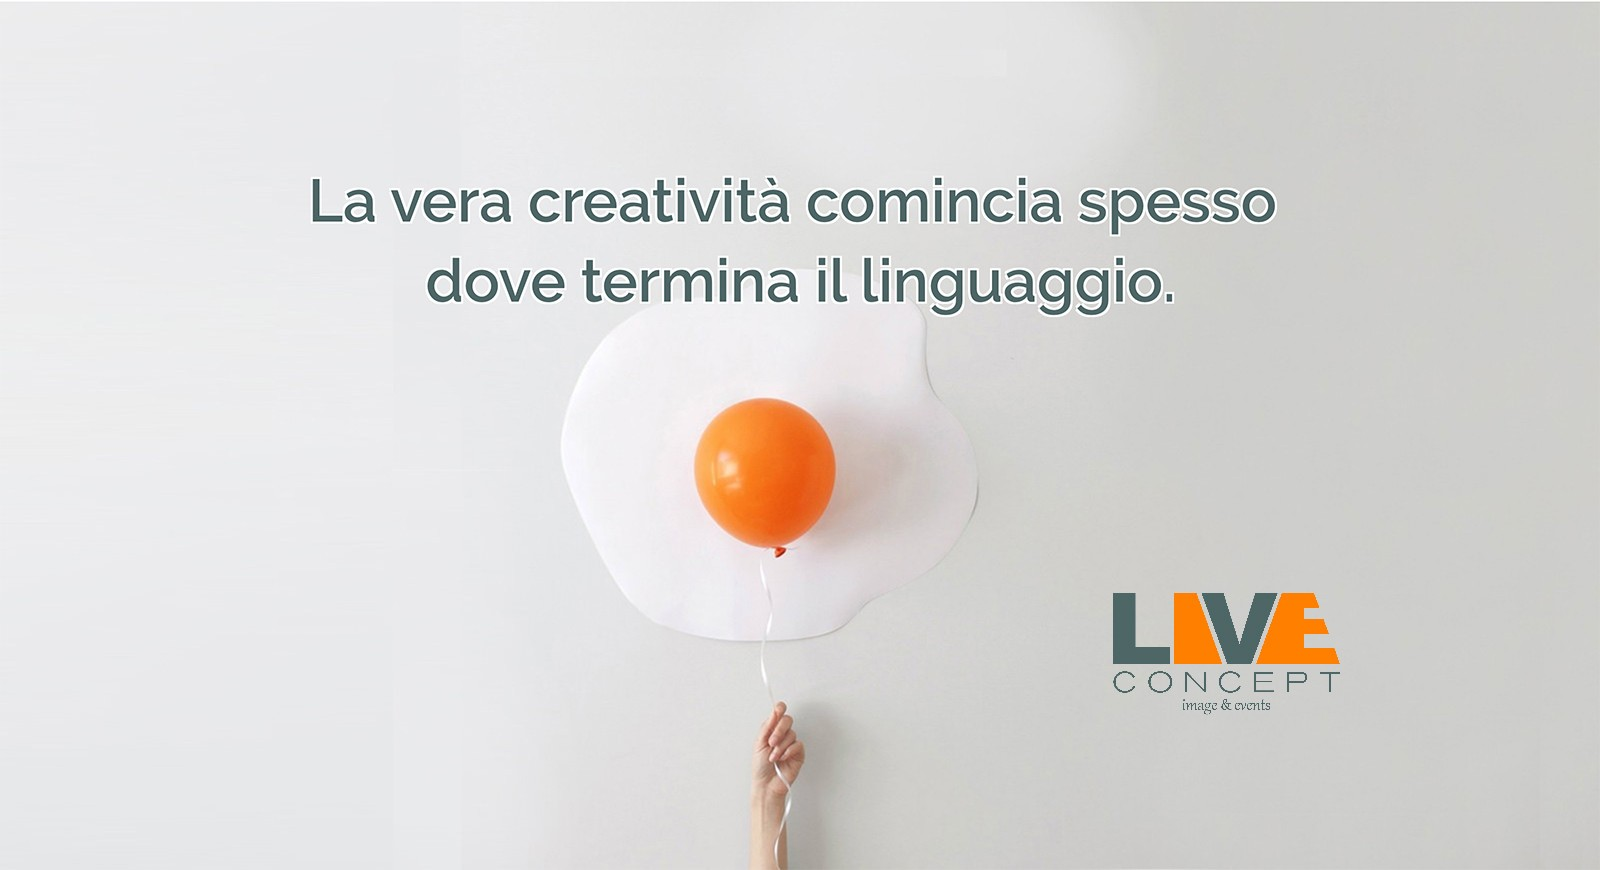 LIVE Concept | image & events